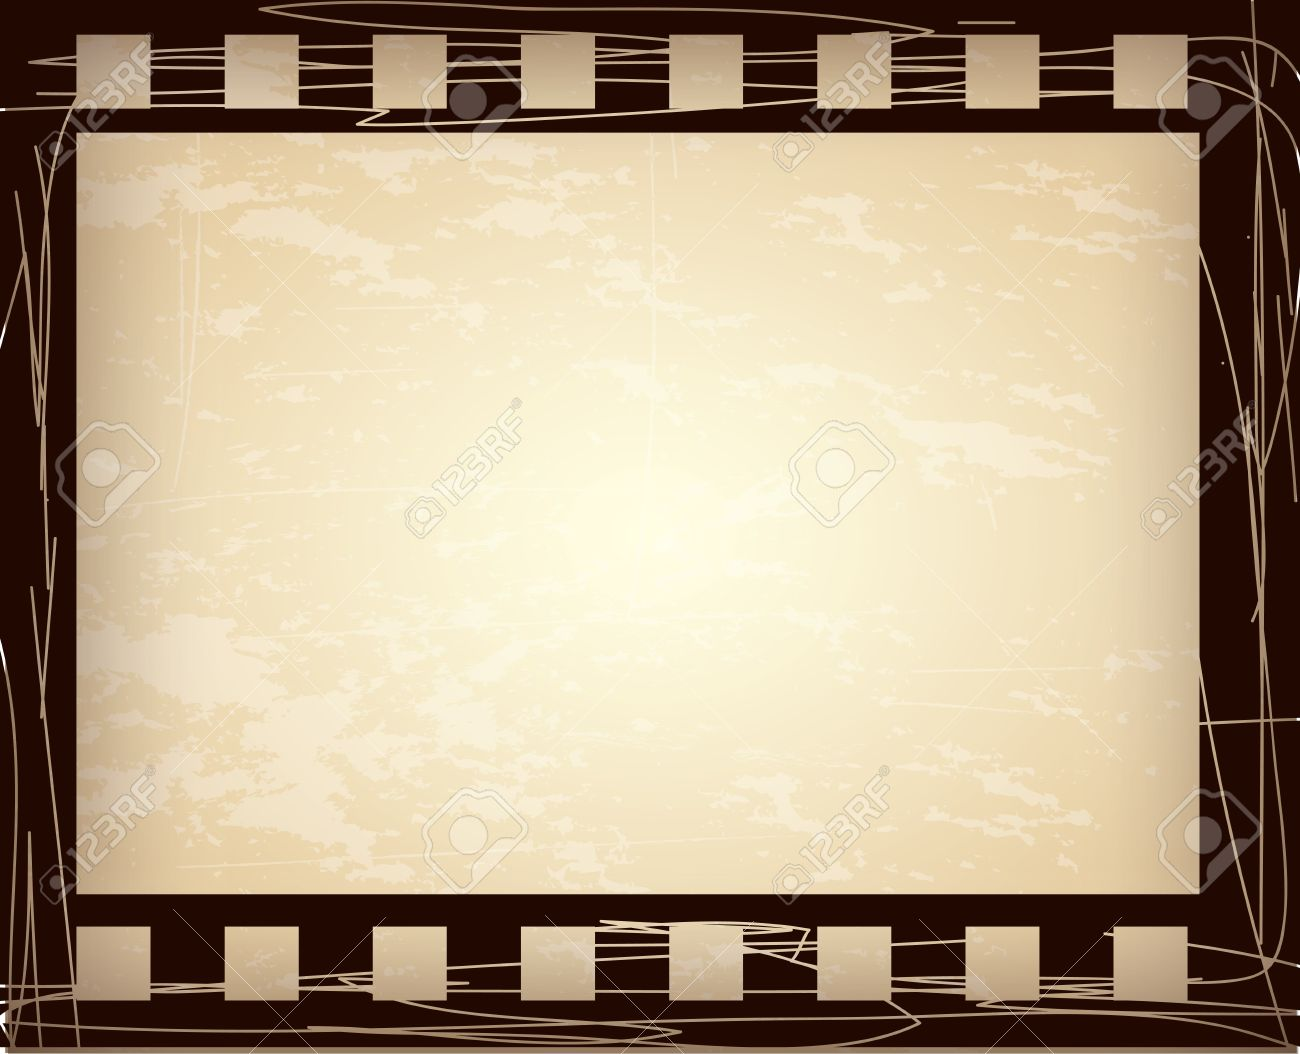 Roll Of Film Over Vintage Background Illustration Royalty Free ...